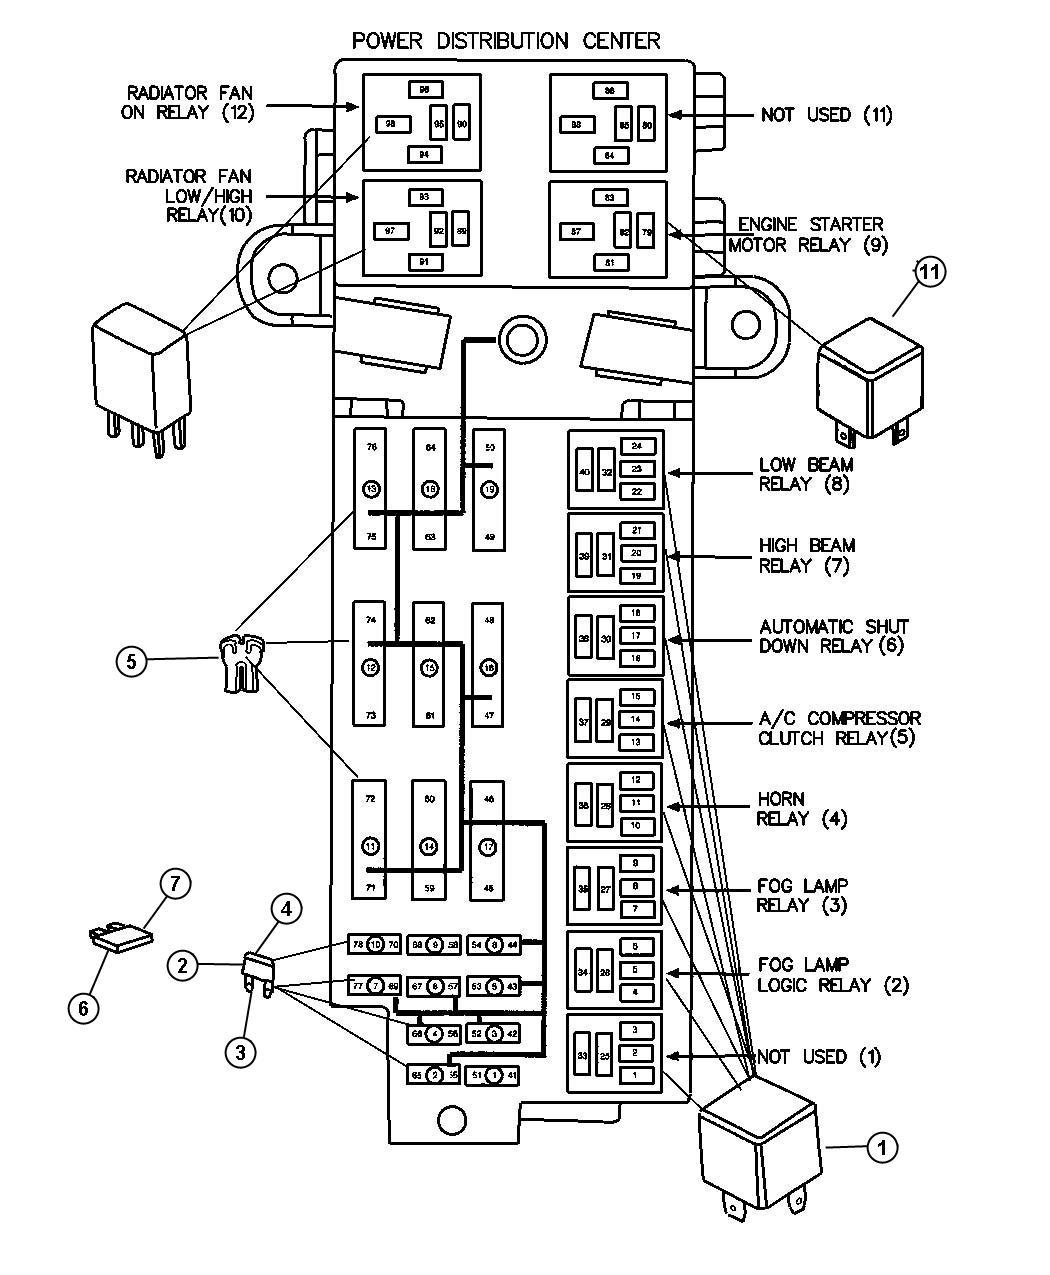 00i95150  Dodge Van Fuse Block Diagram on dodge relay, 2002 durango fuse diagram, isuzu fuse diagram, ac fuse diagram, jaguar fuse diagram, miata fuse diagram, 1998 caravan fuse diagram, lexus fuse diagram, 2013 charger fuse diagram, liberty fuse diagram, buick fuse diagram, mini fuse diagram, 2004 stratus fuse diagram, dakota fuse diagram, 2006 charger fuse diagram, bronco fuse diagram, mgb fuse diagram, volvo fuse diagram, scion fuse diagram, bass tracker fuse diagram,